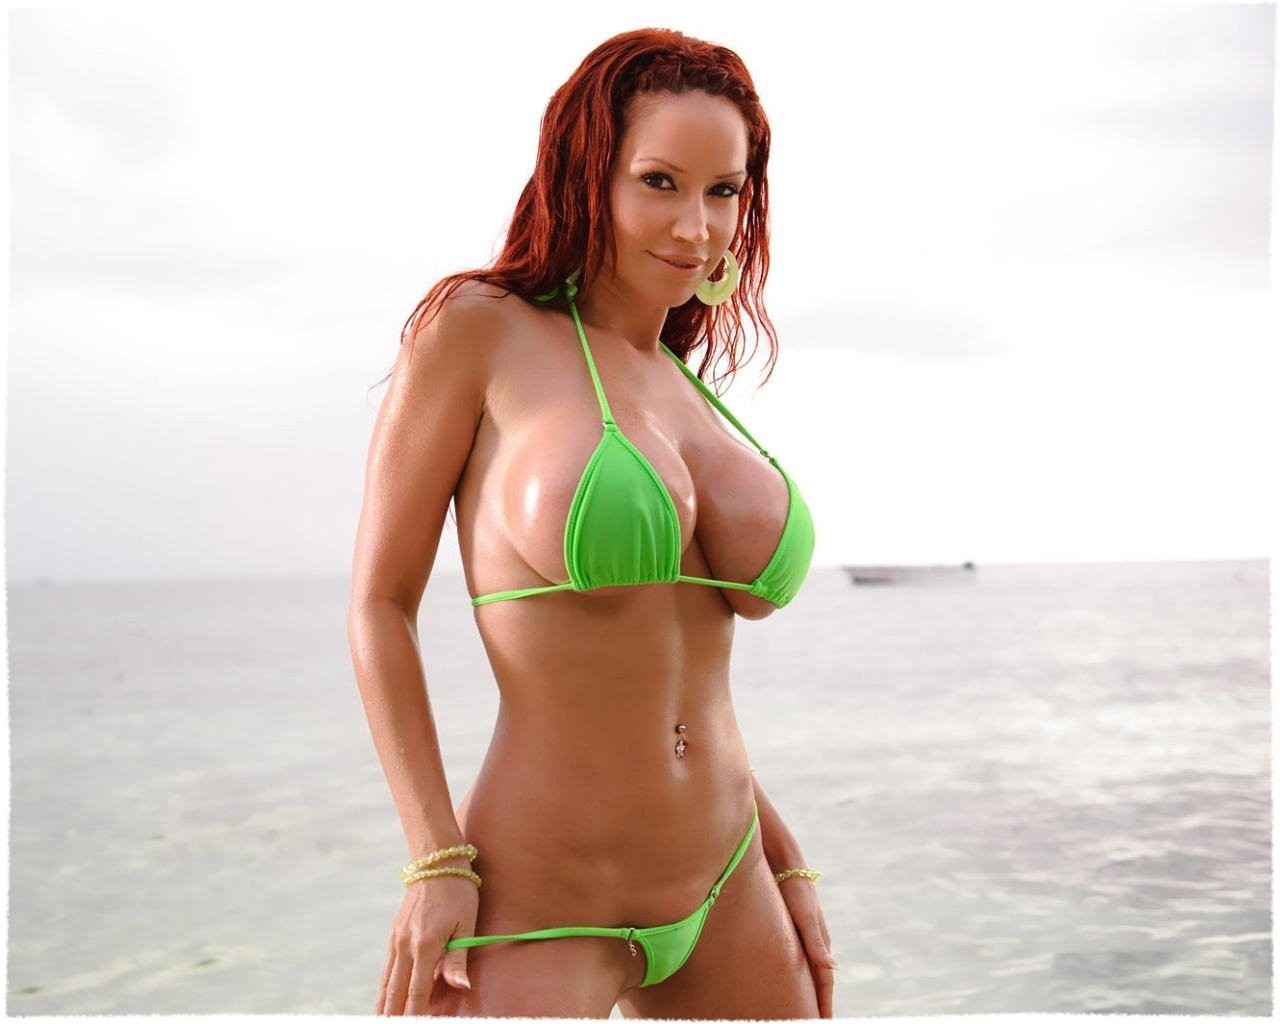 Bianca Beauchamp Sexy Wallpaper HD - Kumpulan Artikel